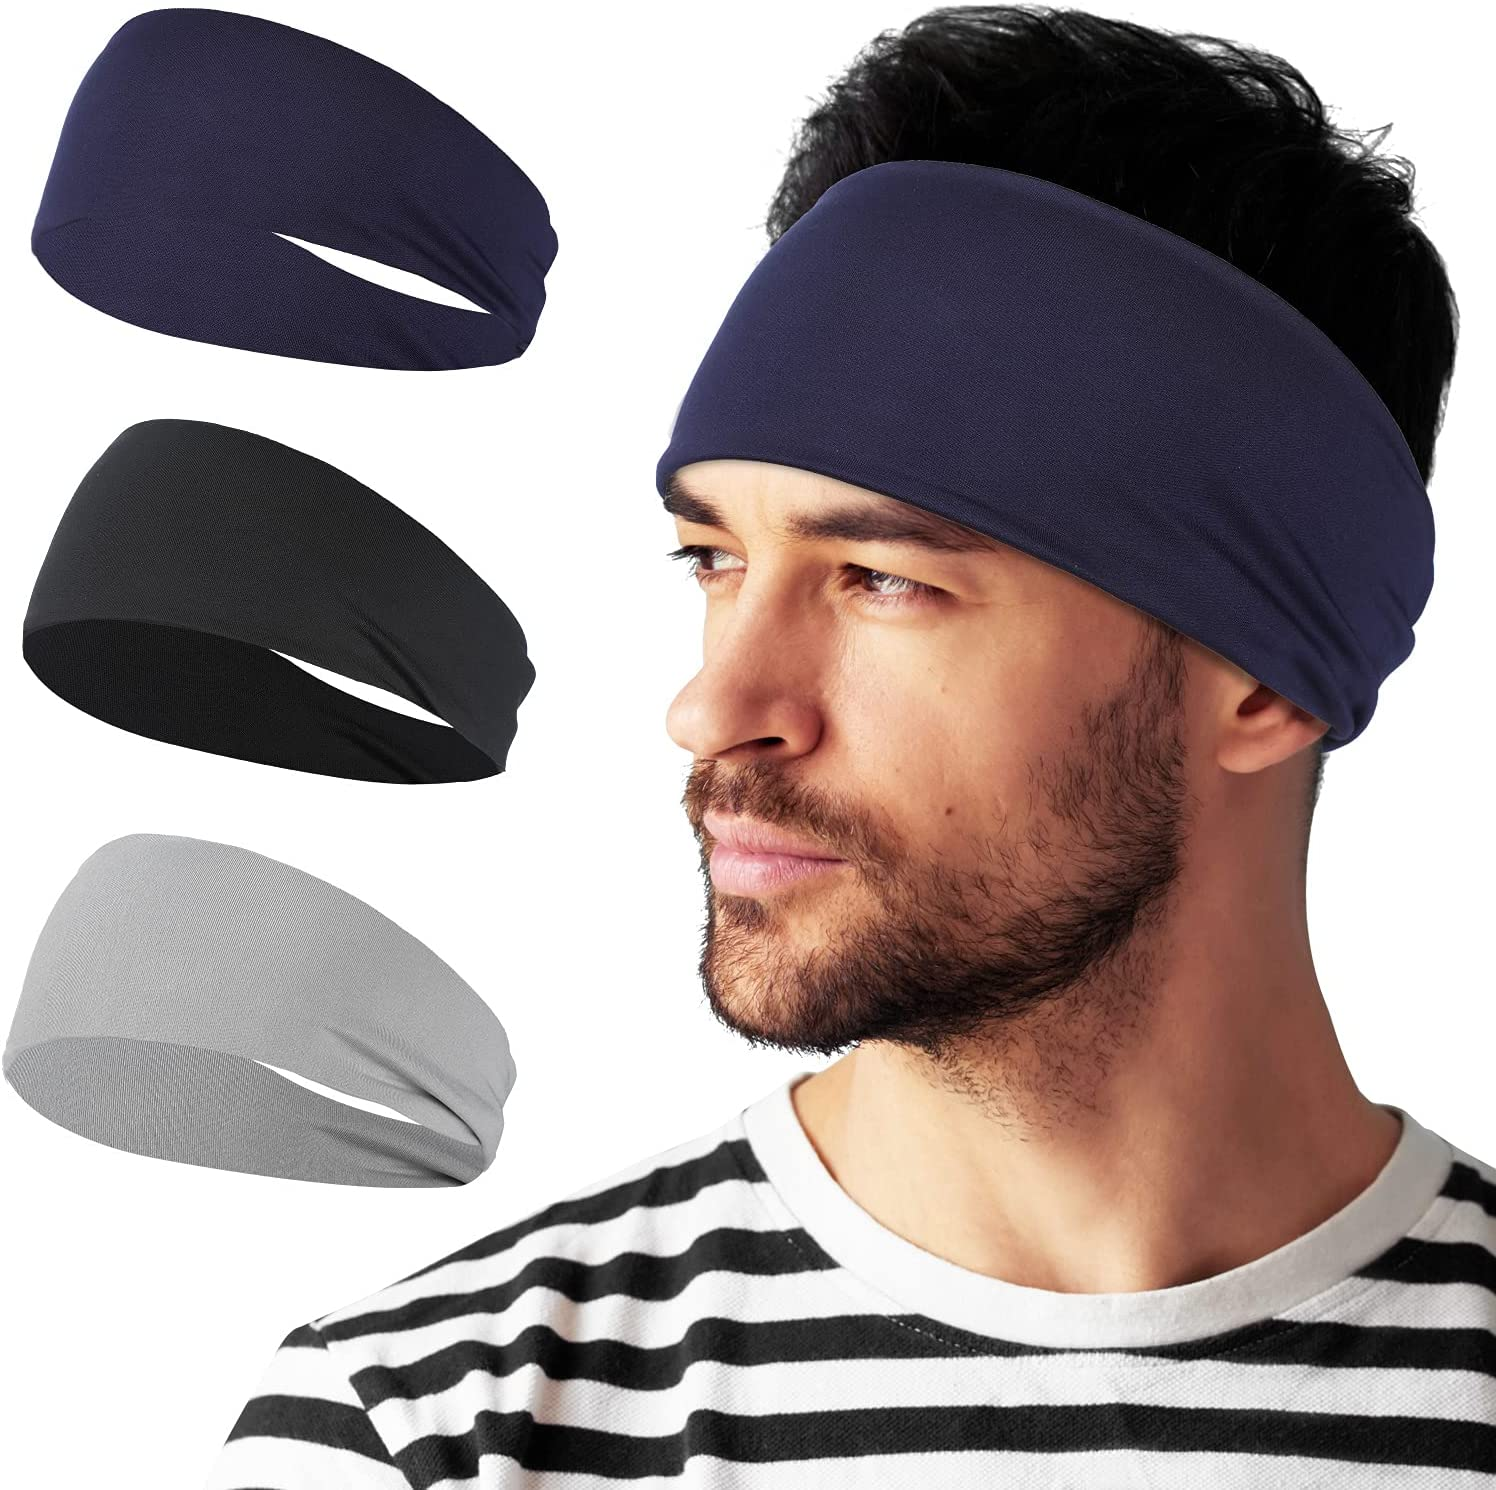 Mens Be super welcome Headband Nippon regular agency - 3 Pack Sweat Headbands for Band Running Runnin